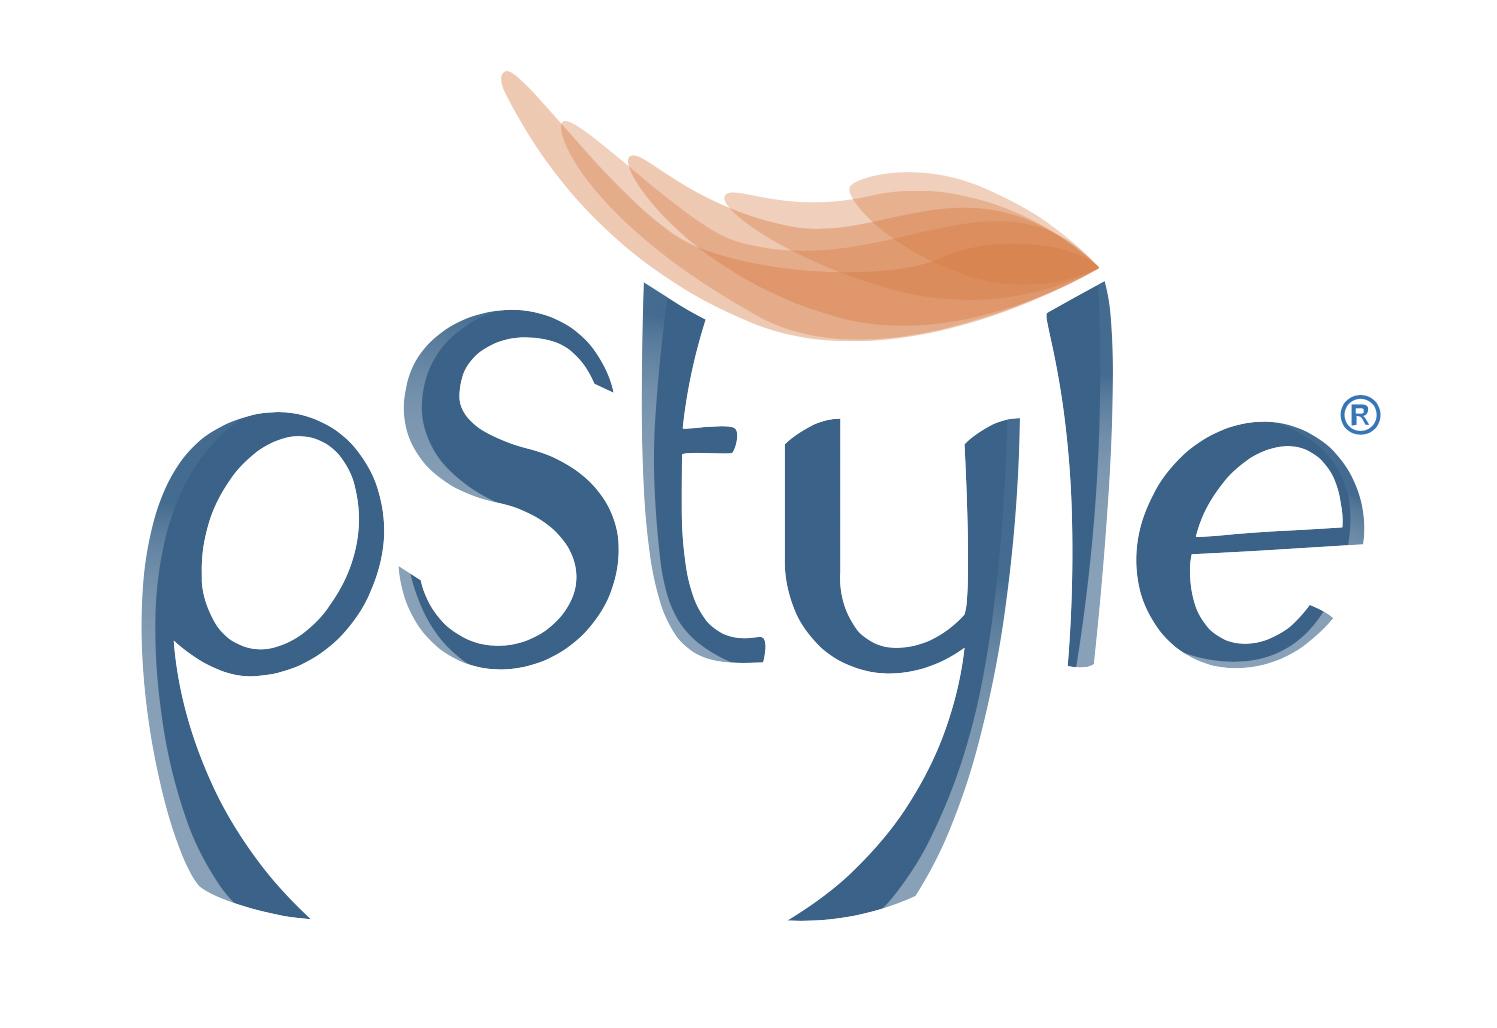 pStyle